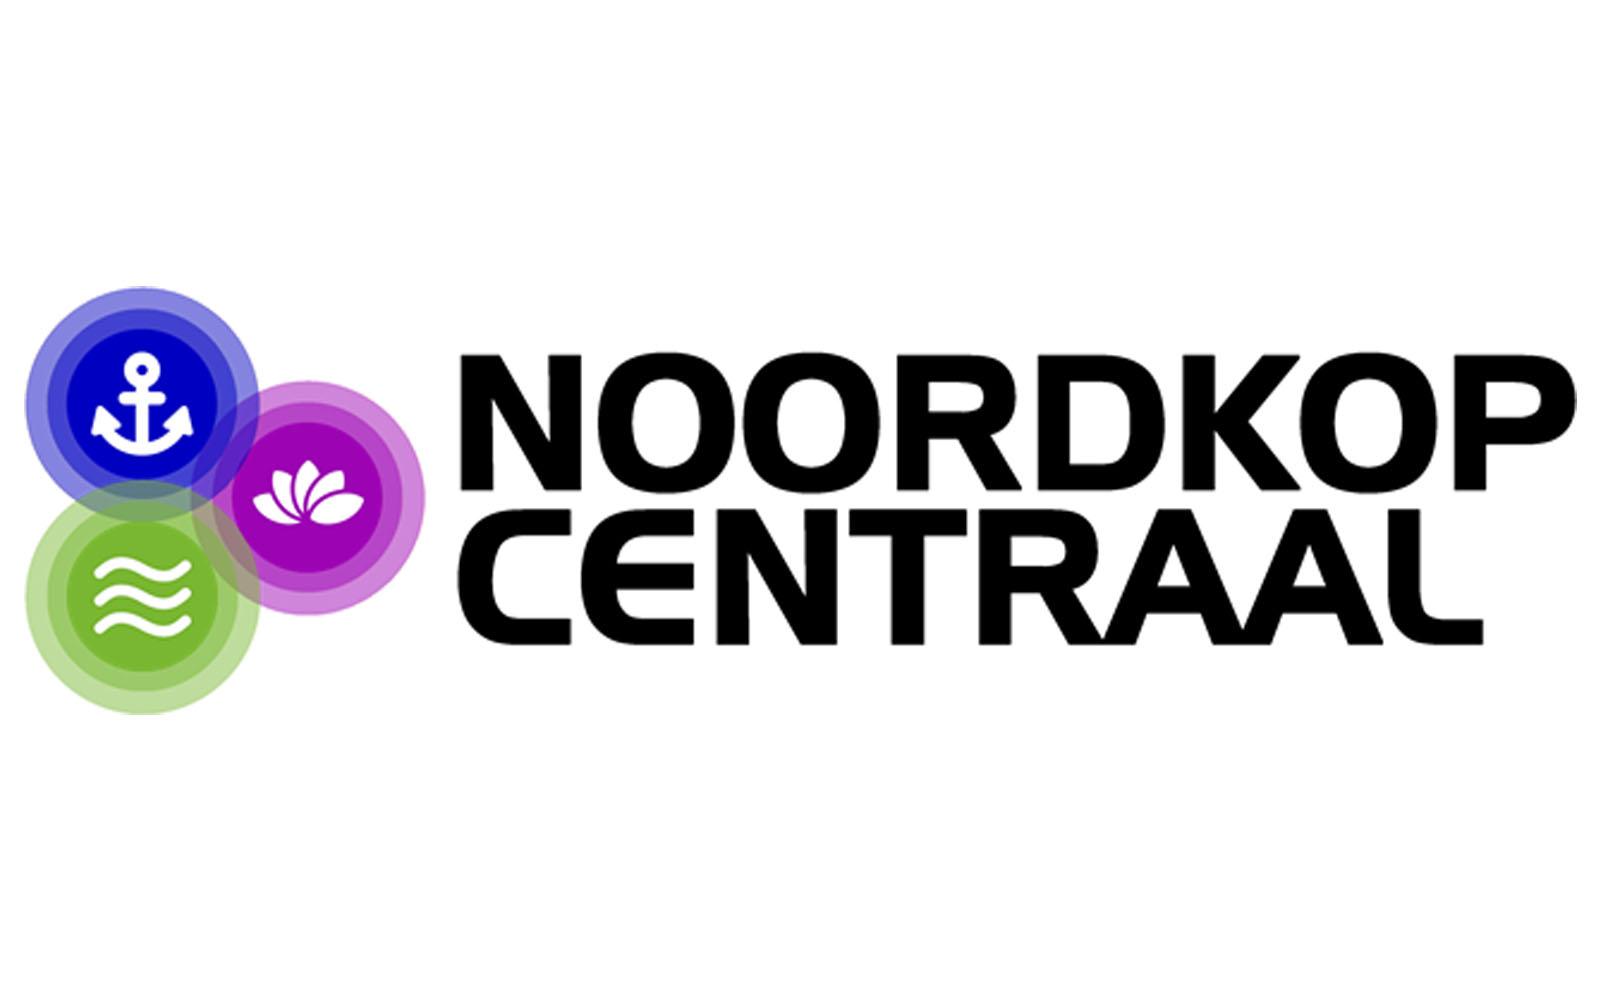 Noordkop Centraal Logo